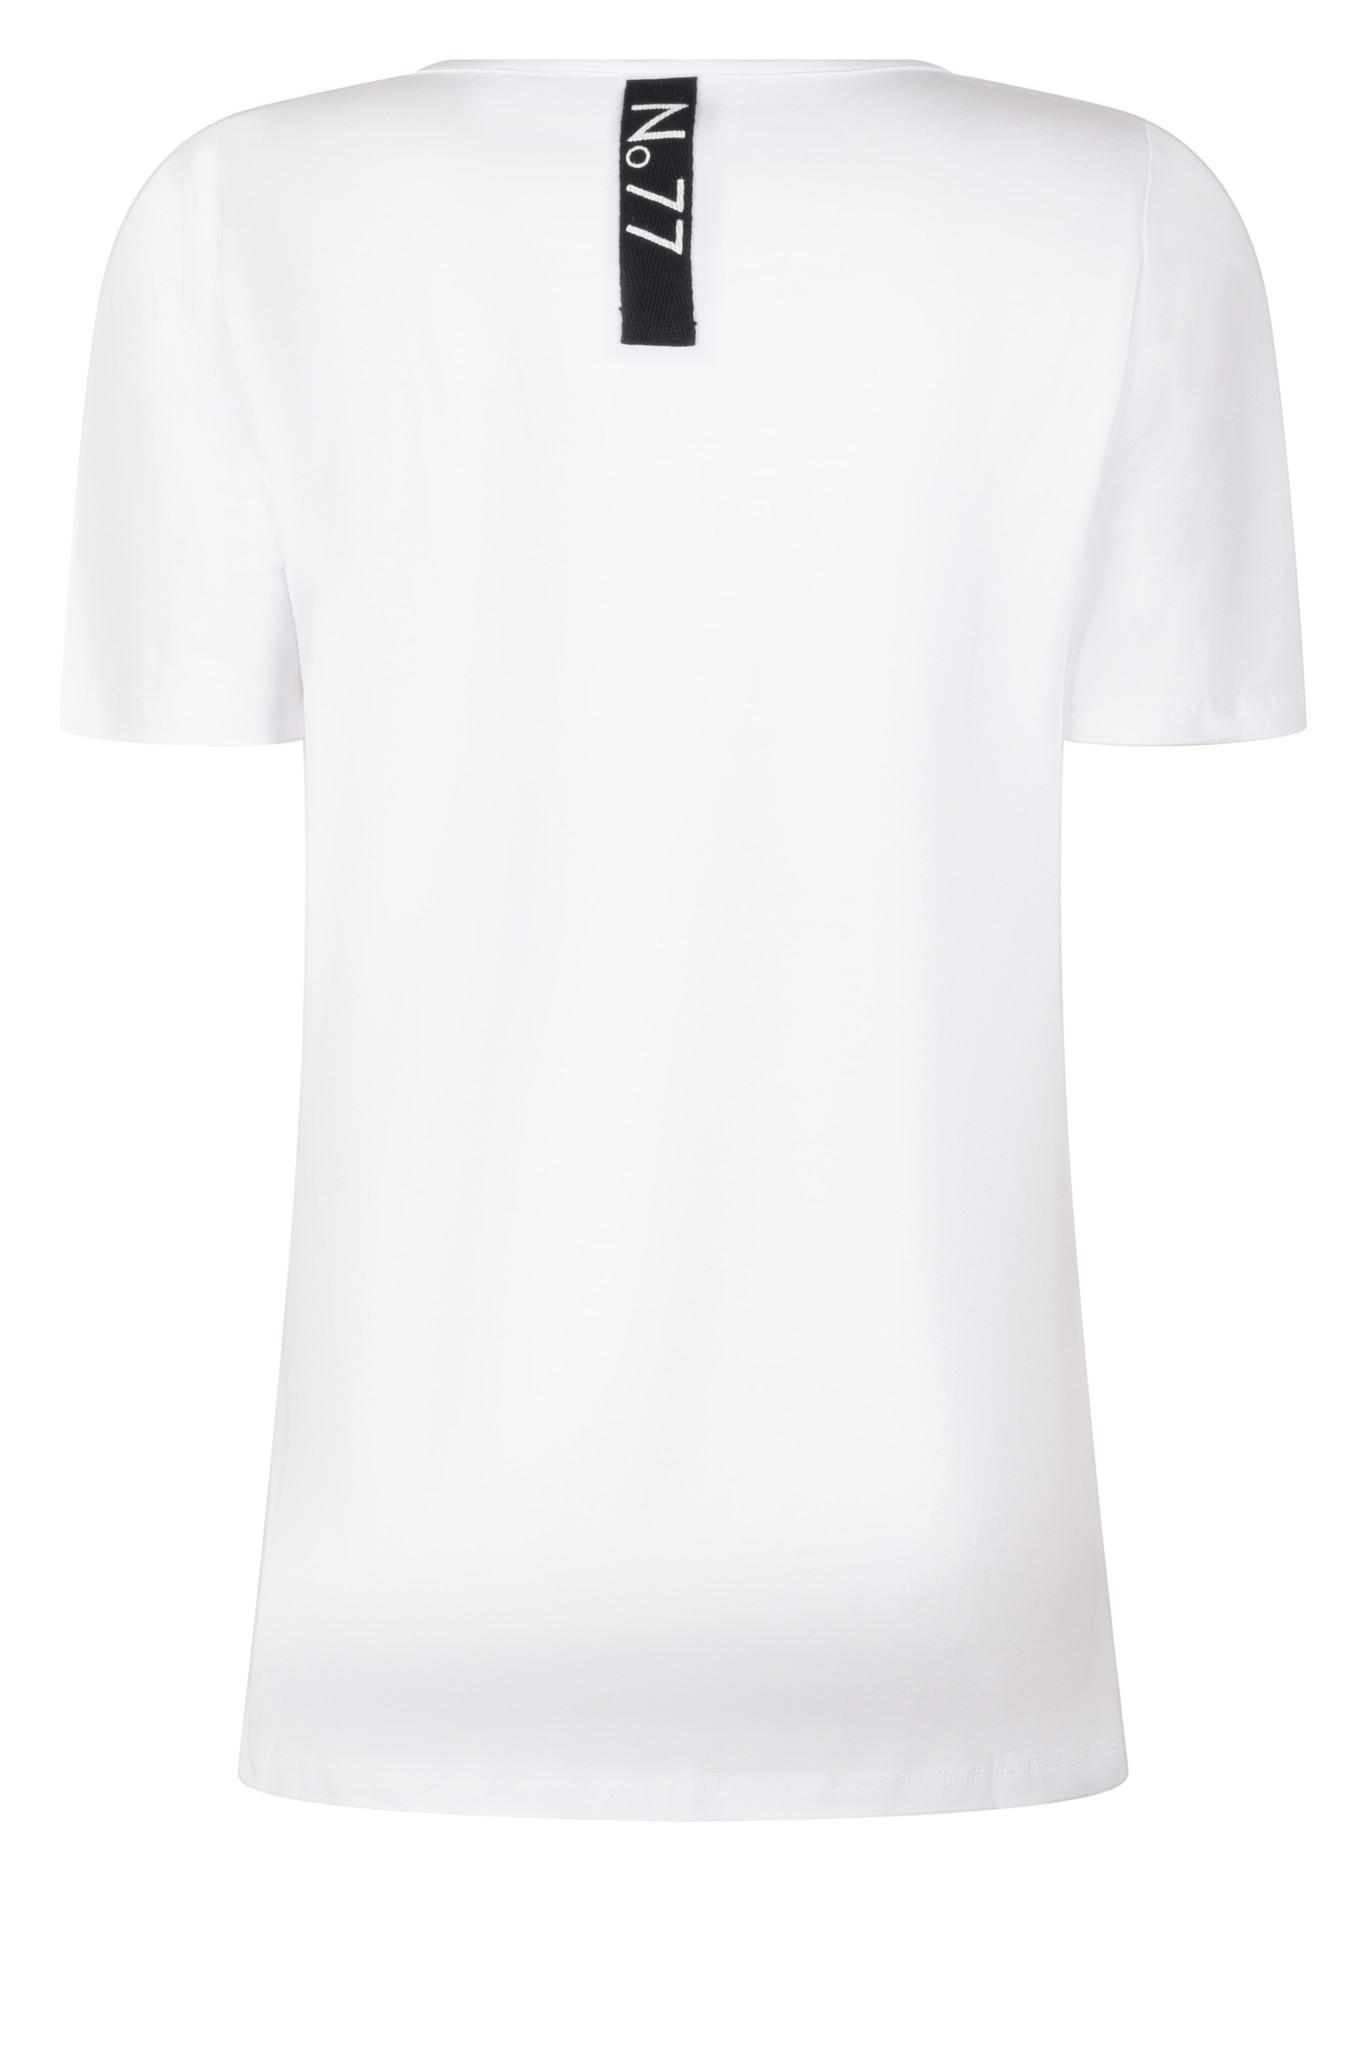 Zoso Zoso Megan T shirt  Camouflage print/wit